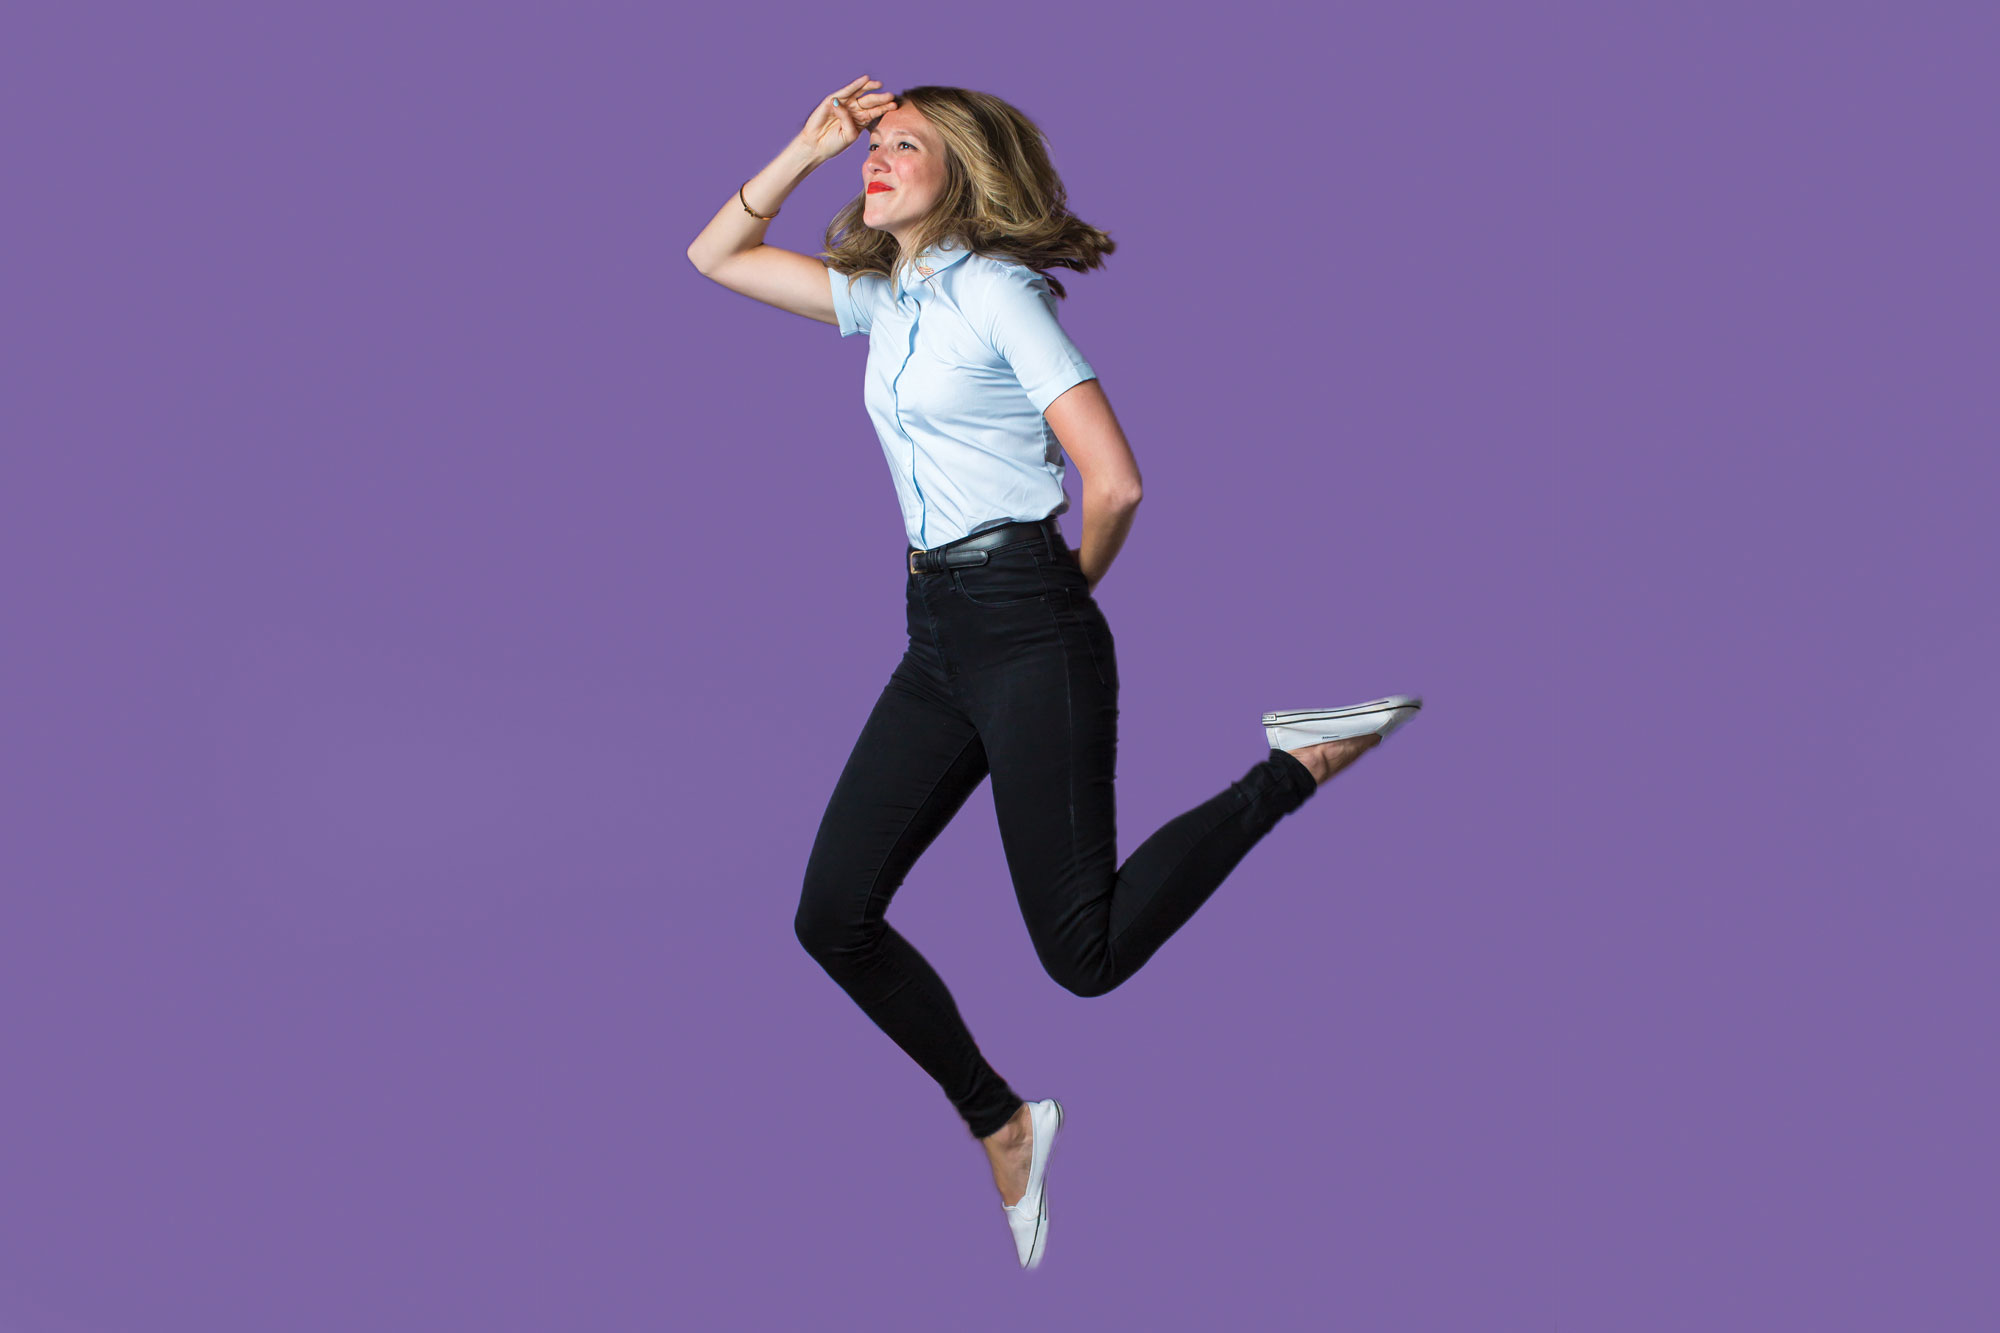 andrea-crofts-levitation.jpg